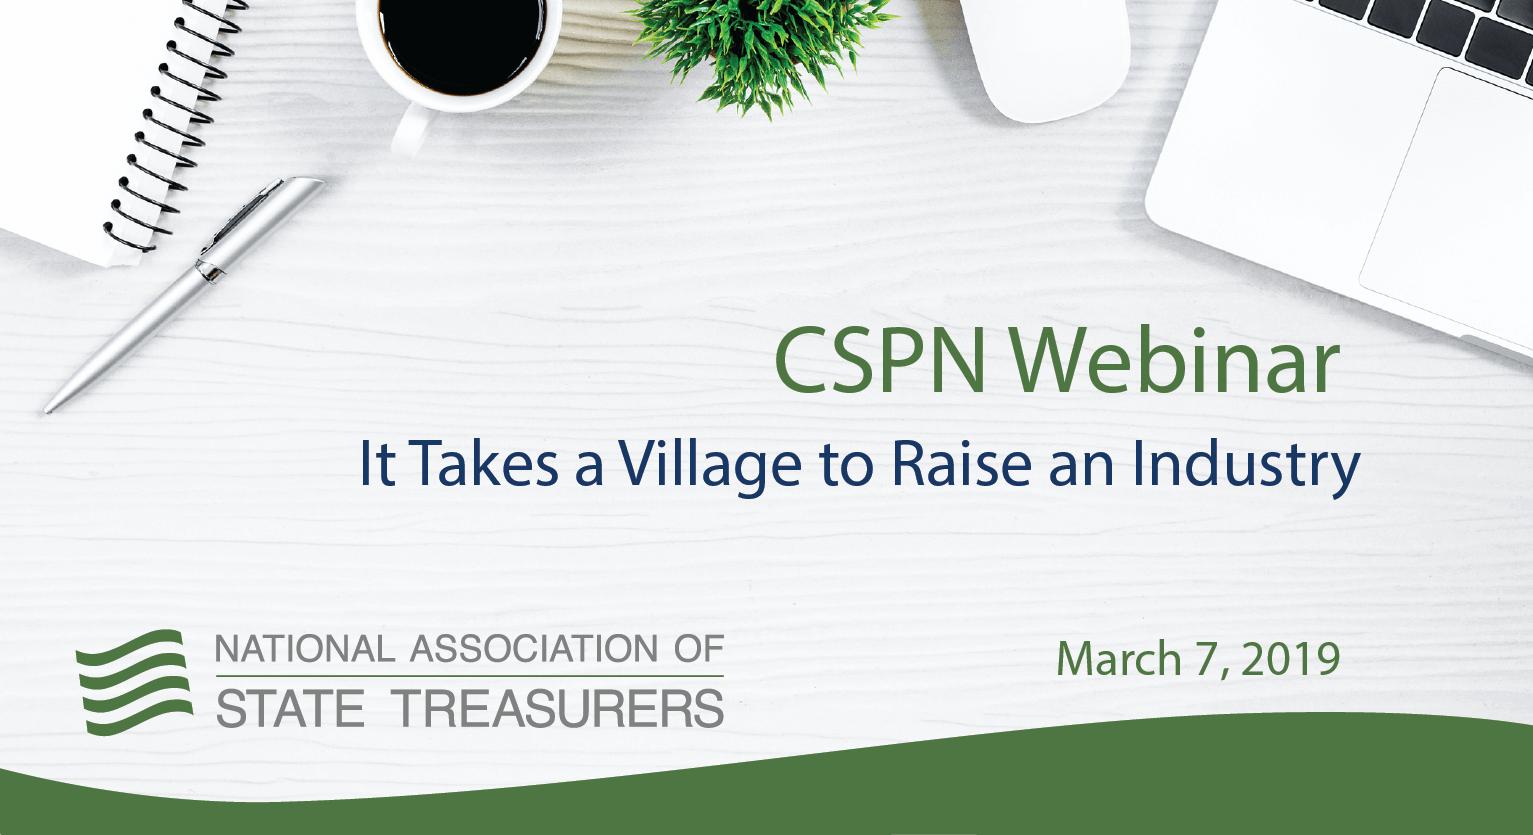 CSPN Webinar - It Takes a Village to Raise an Industry